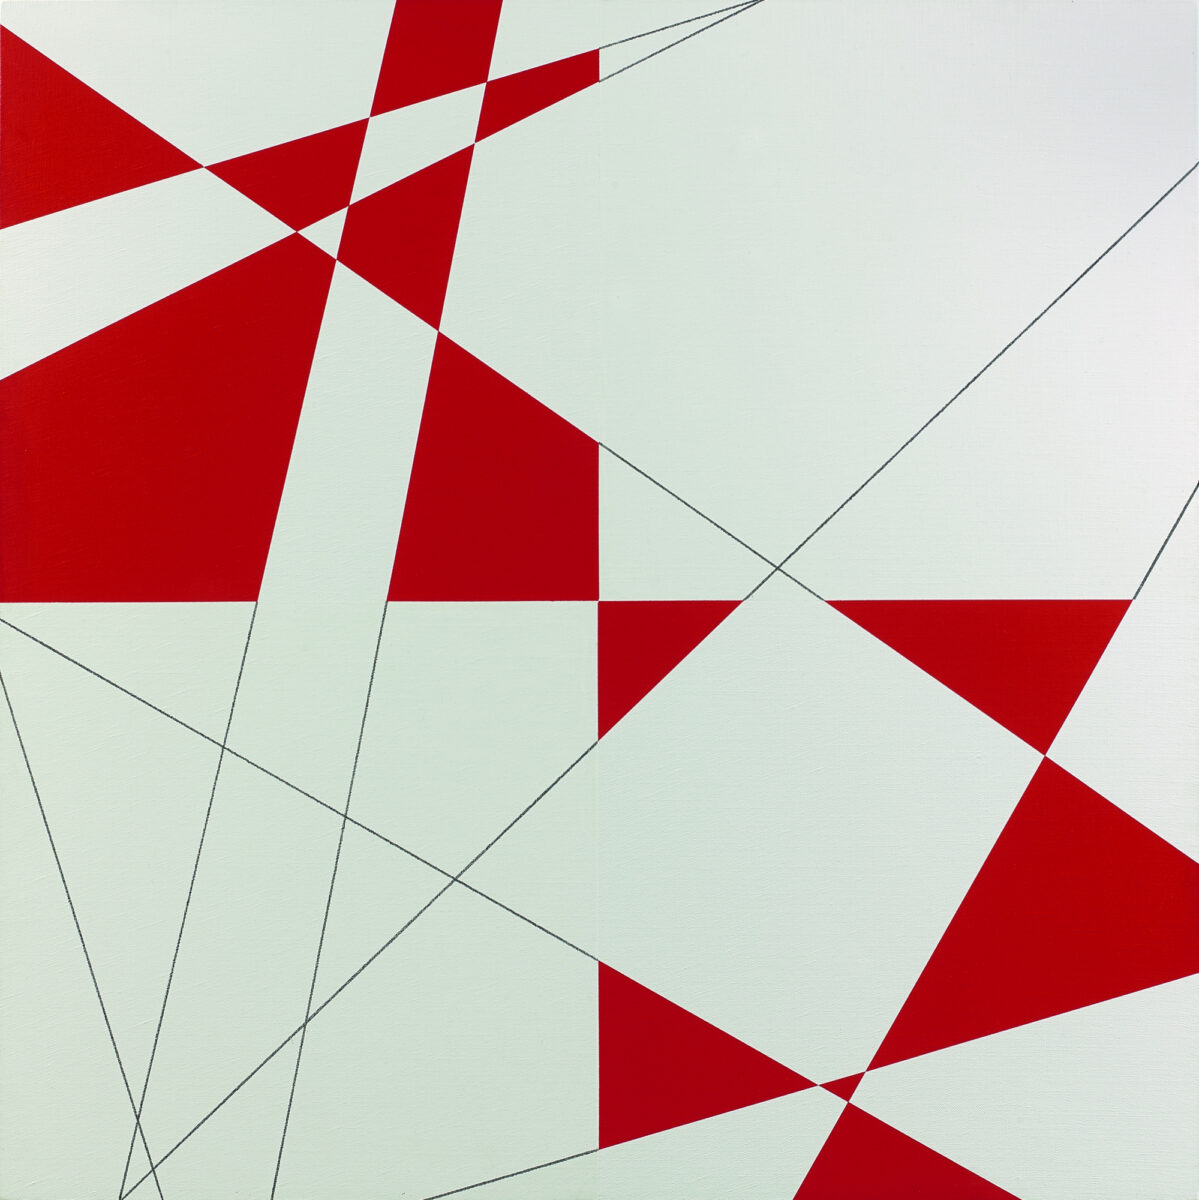 François Morellet 10 Lignes au Hasard Hybrides Rouge et Blanc original painting for sale